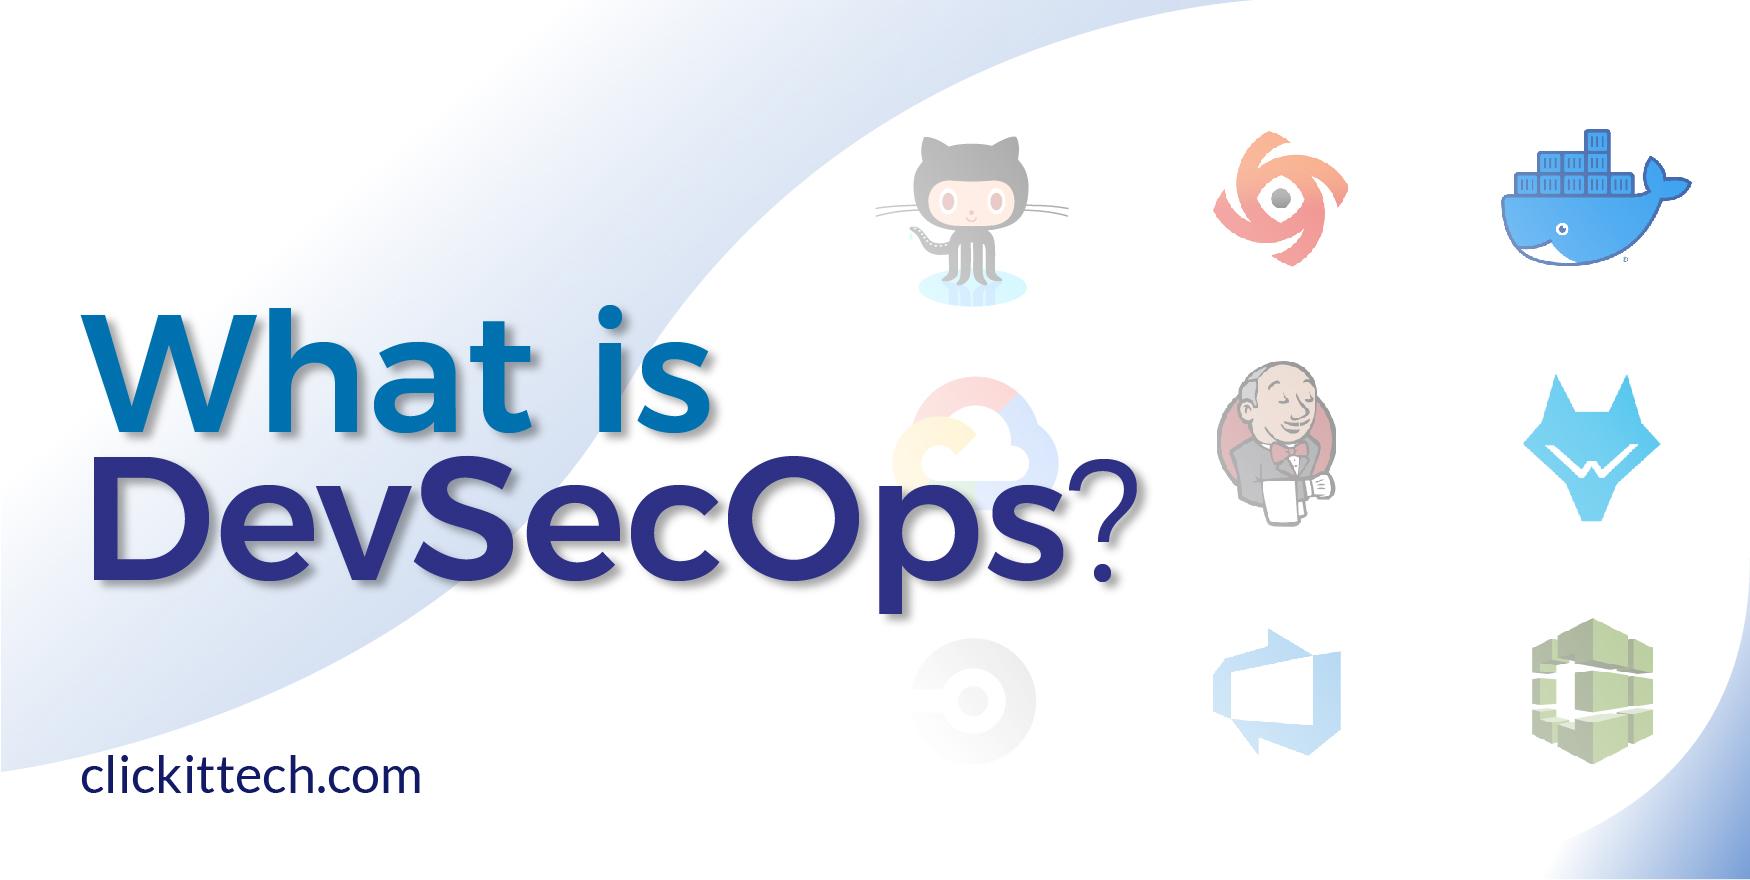 What is DevSecOps?